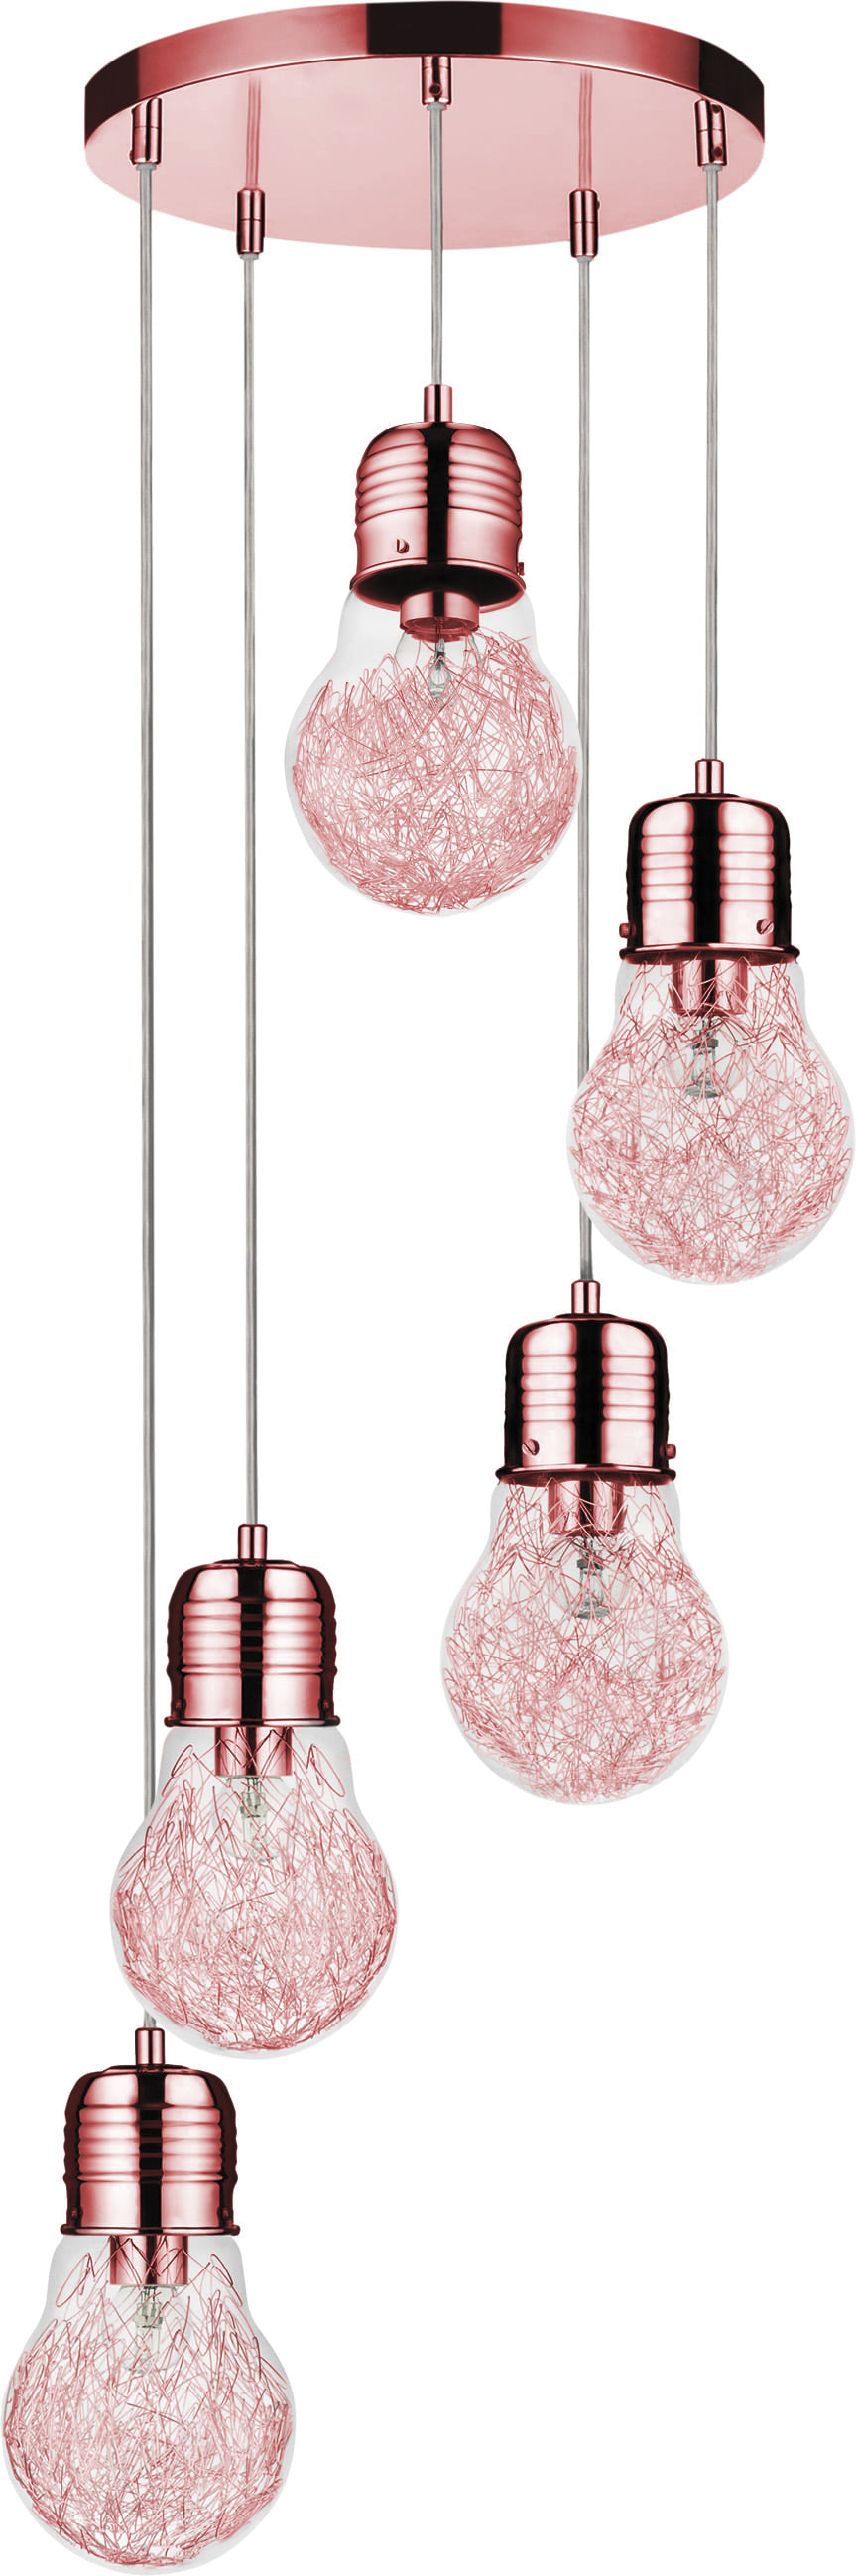 A five-point LIndustrial Hanging Bulb Bulb copper E27 60W